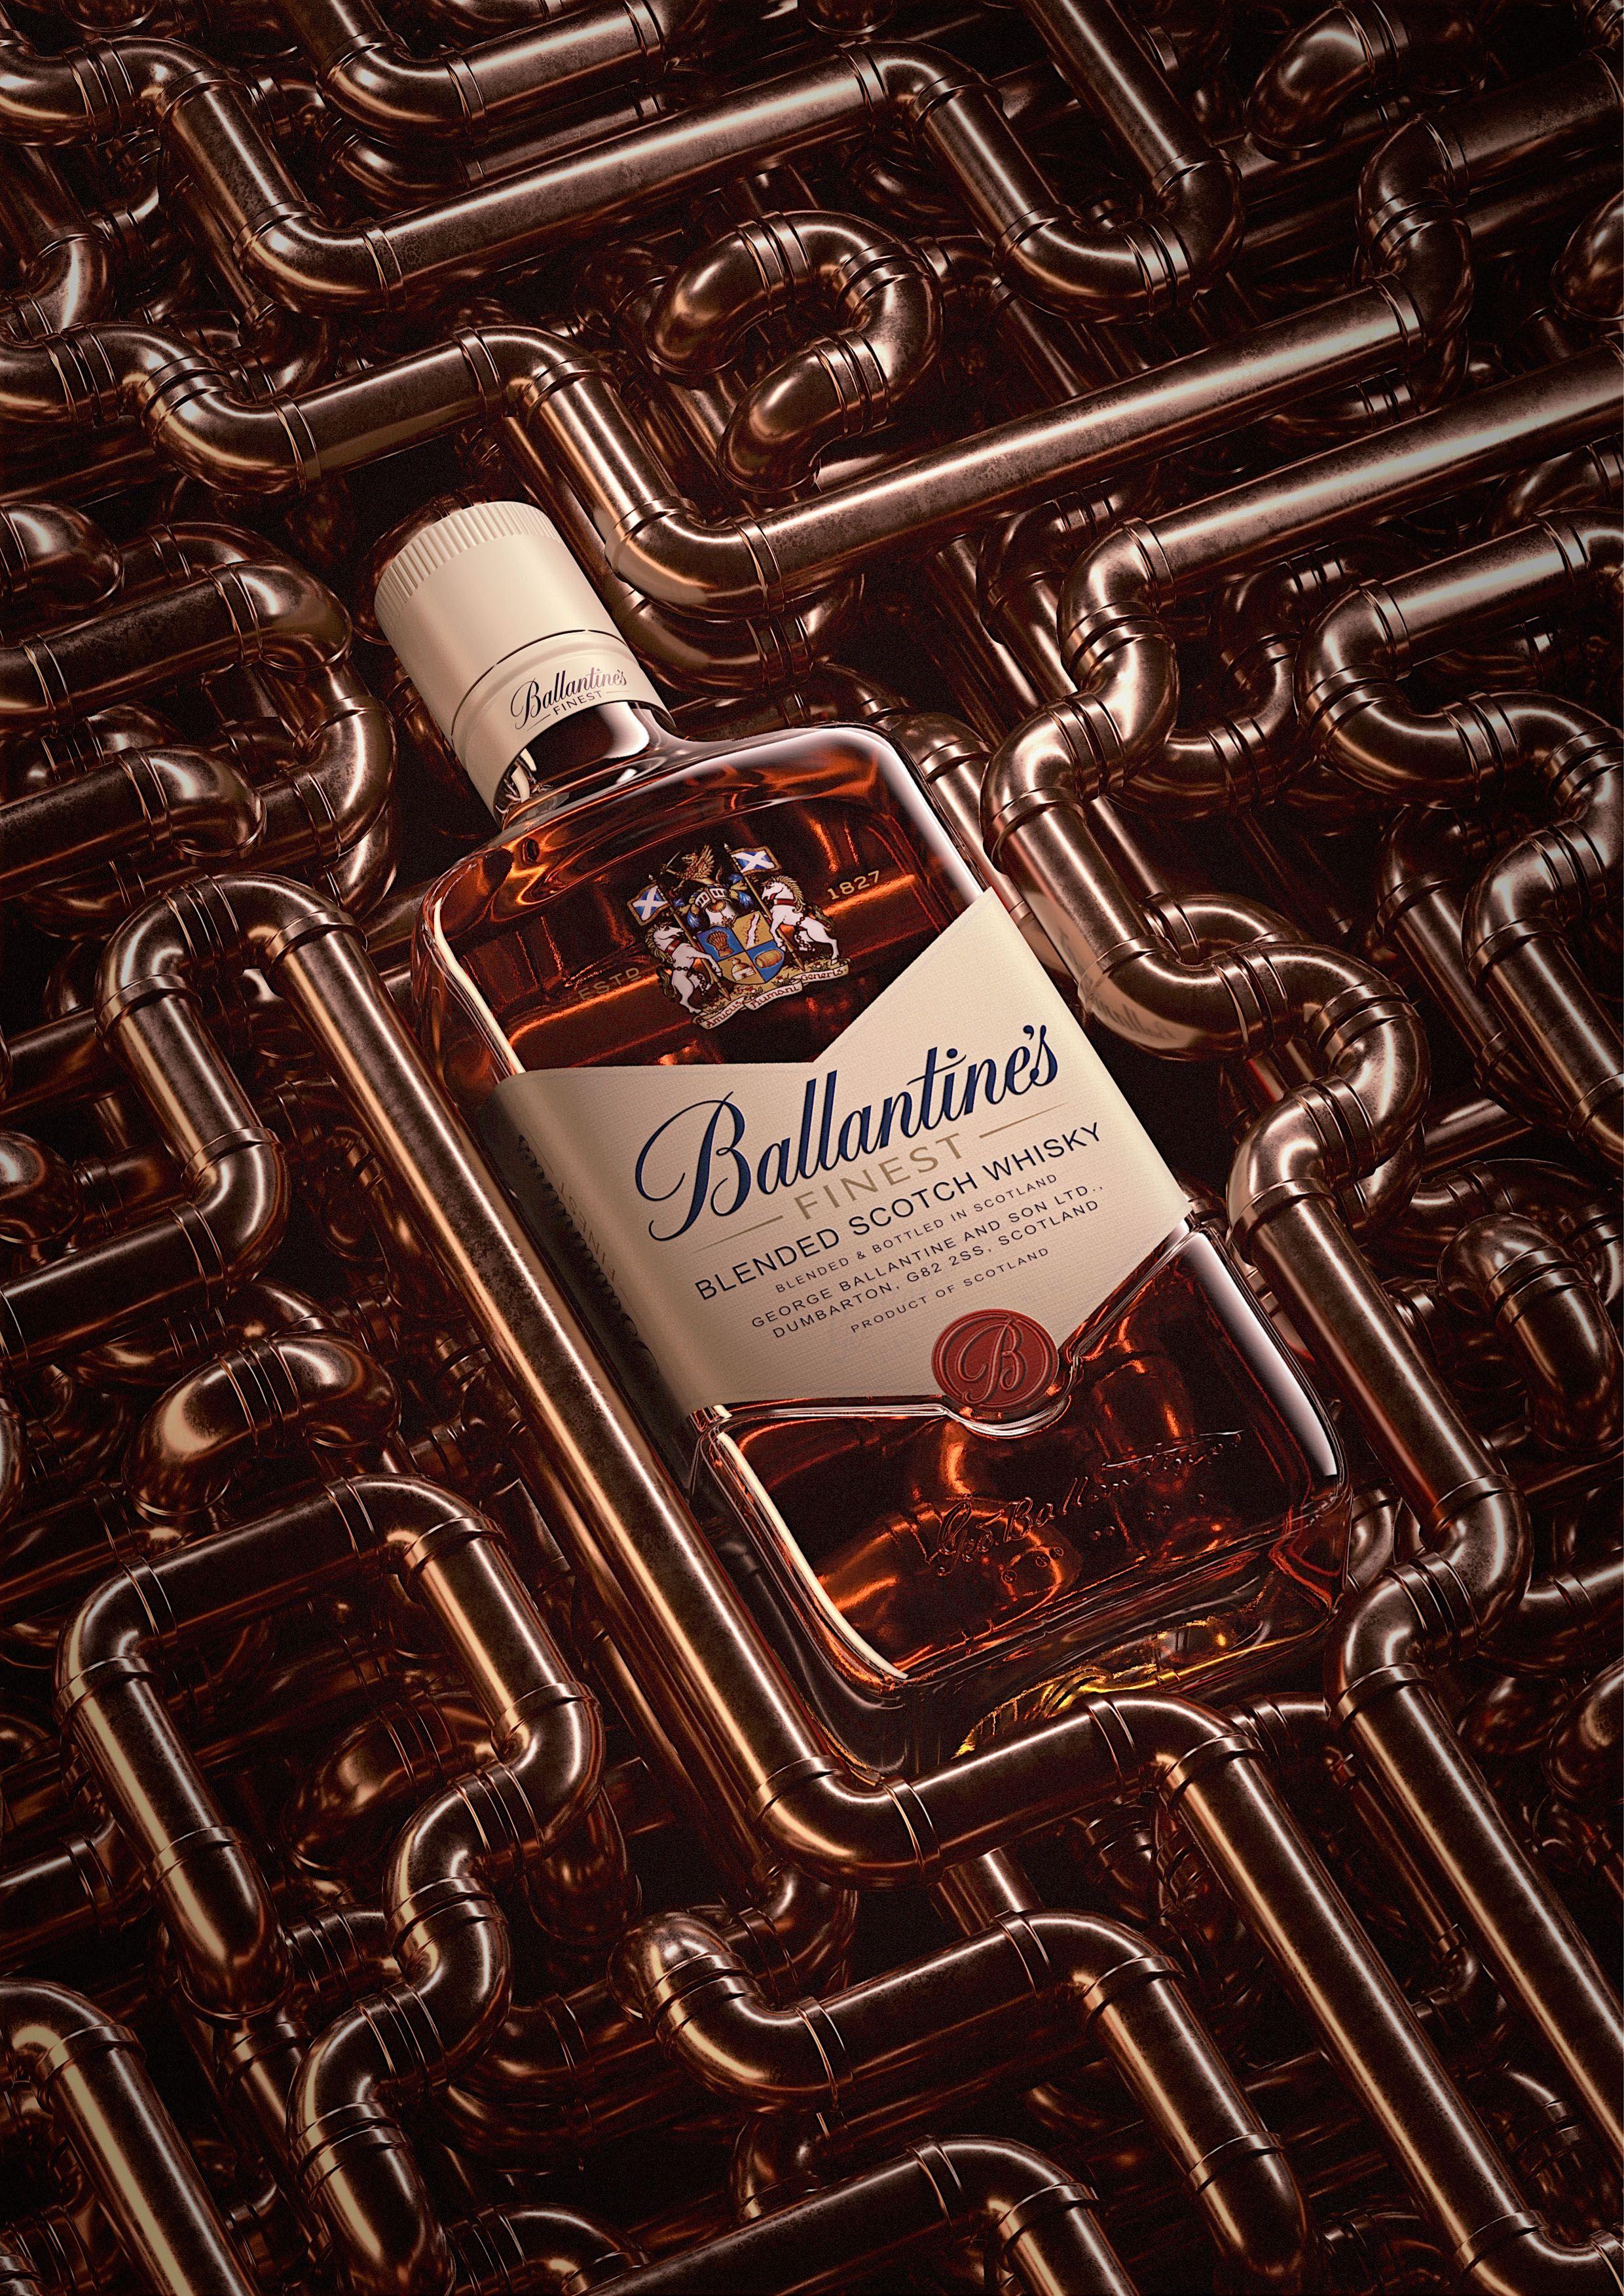 Personnal Project About Ballantine S Bottle Packshot Ballantines